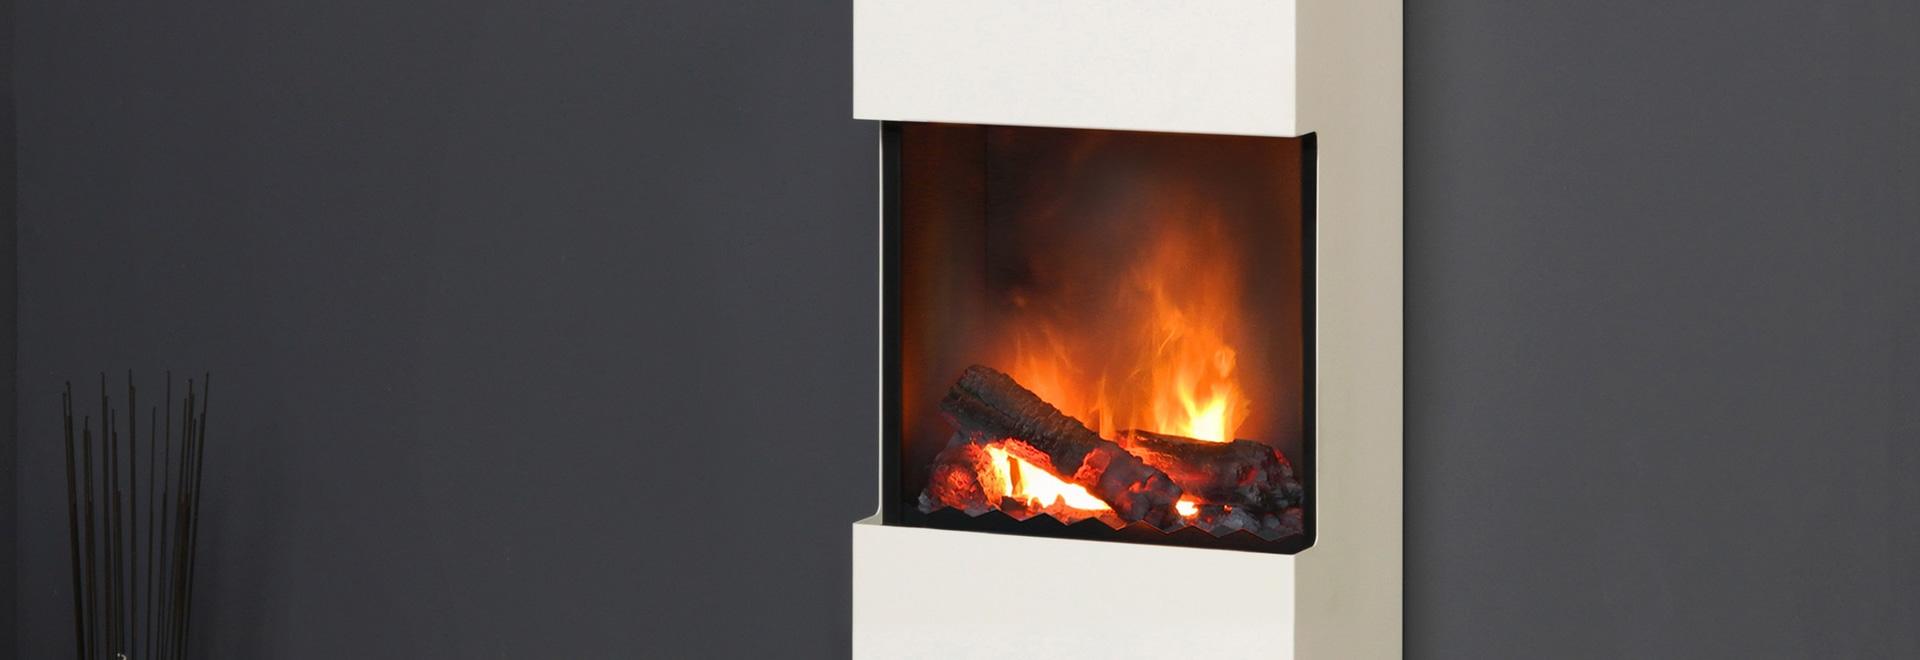 muenkel design flip [chimenea eléctrica / de etanol de pared o de pie]